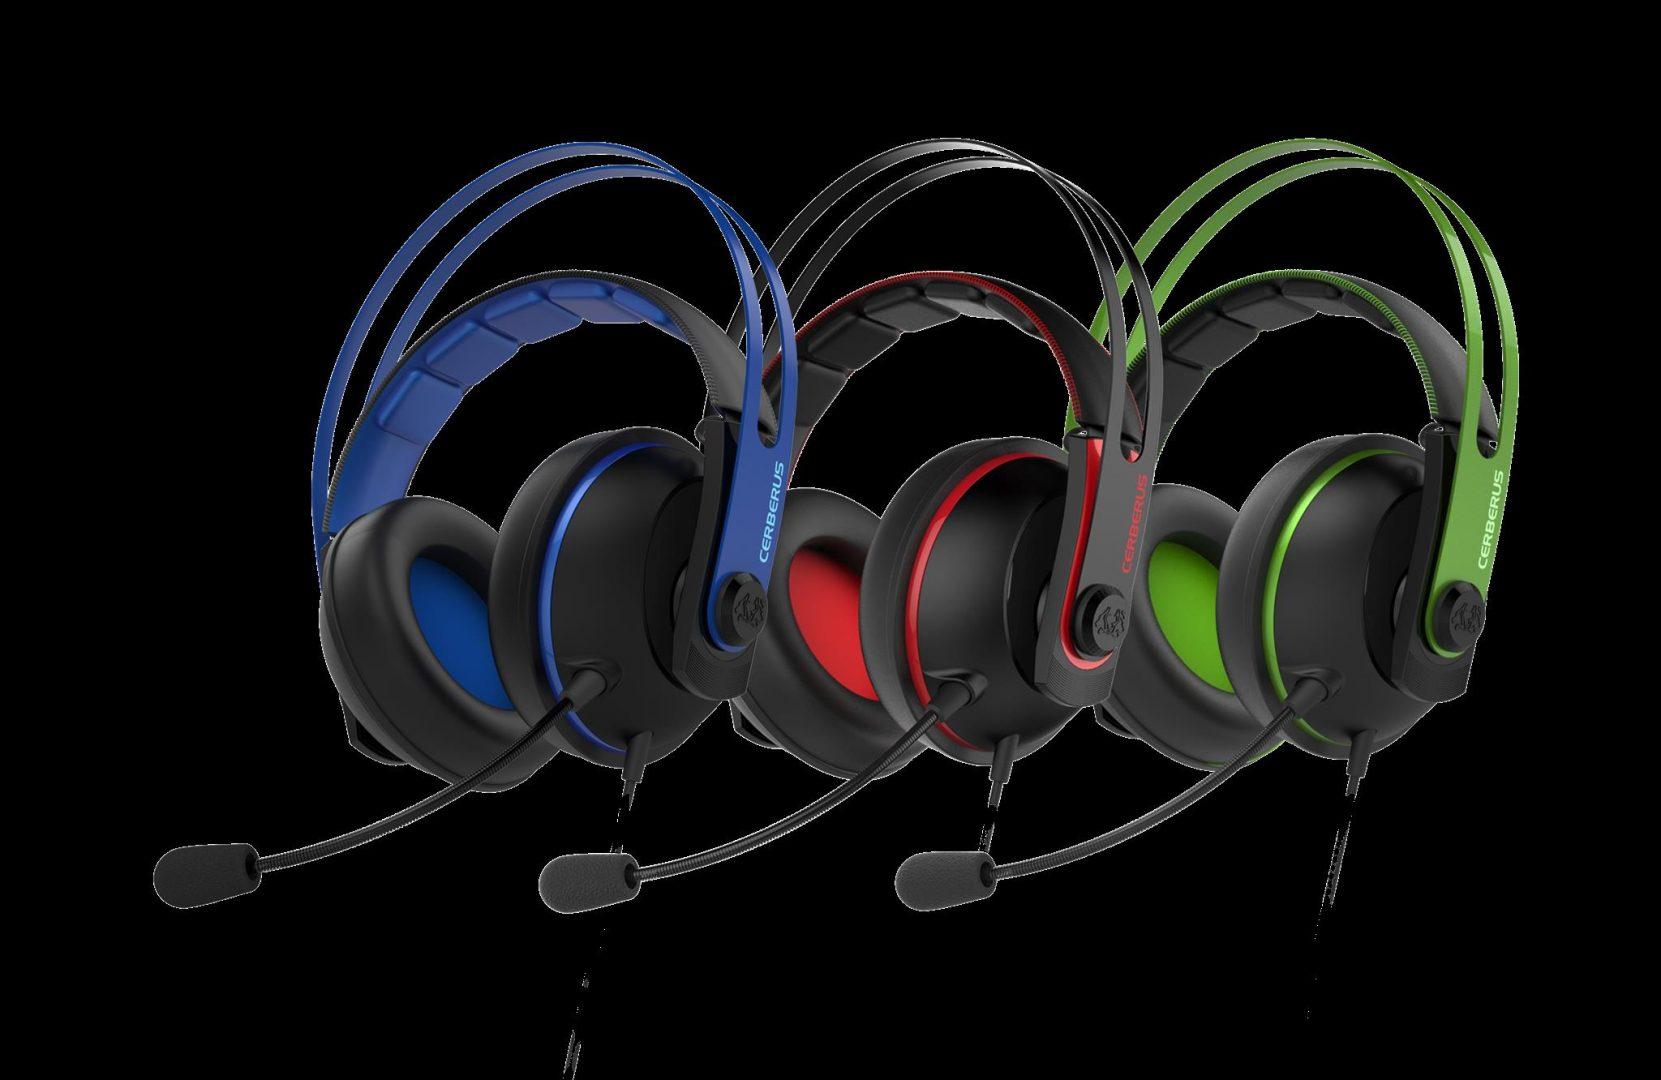 Ceberus V2 gaming headset_3 colors